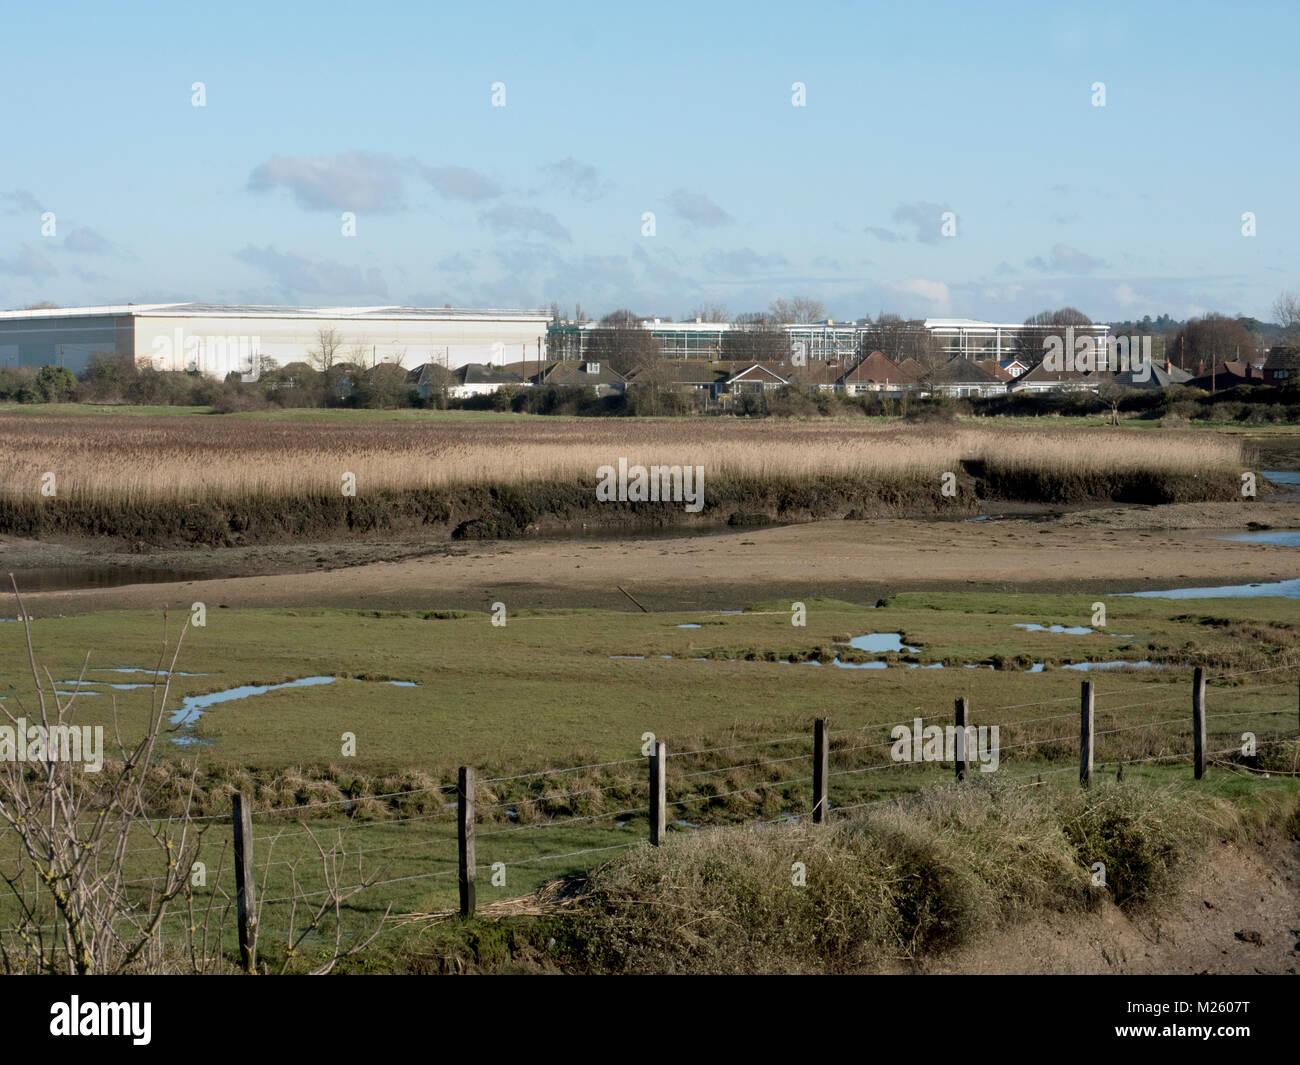 Lower Test Estuary, Southampton Water, Hampshire. Area of coastal and wetland habitats in a tidal estuary. UK Stock Photo